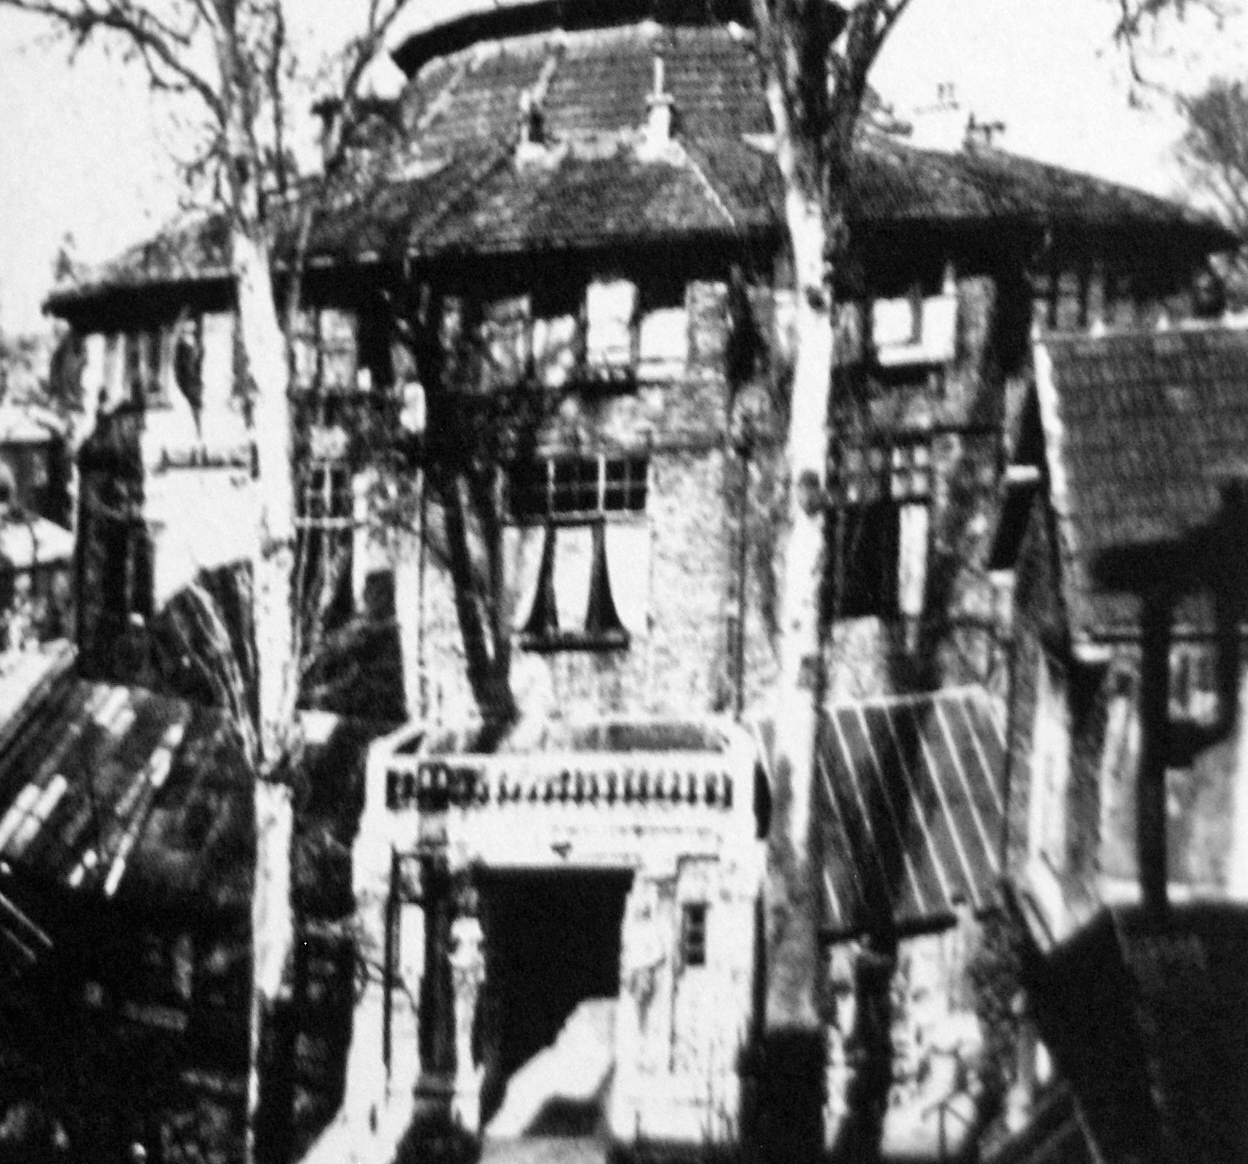 file la ruche 2 montparnasse paris 1918 amedeo modigliani. Black Bedroom Furniture Sets. Home Design Ideas